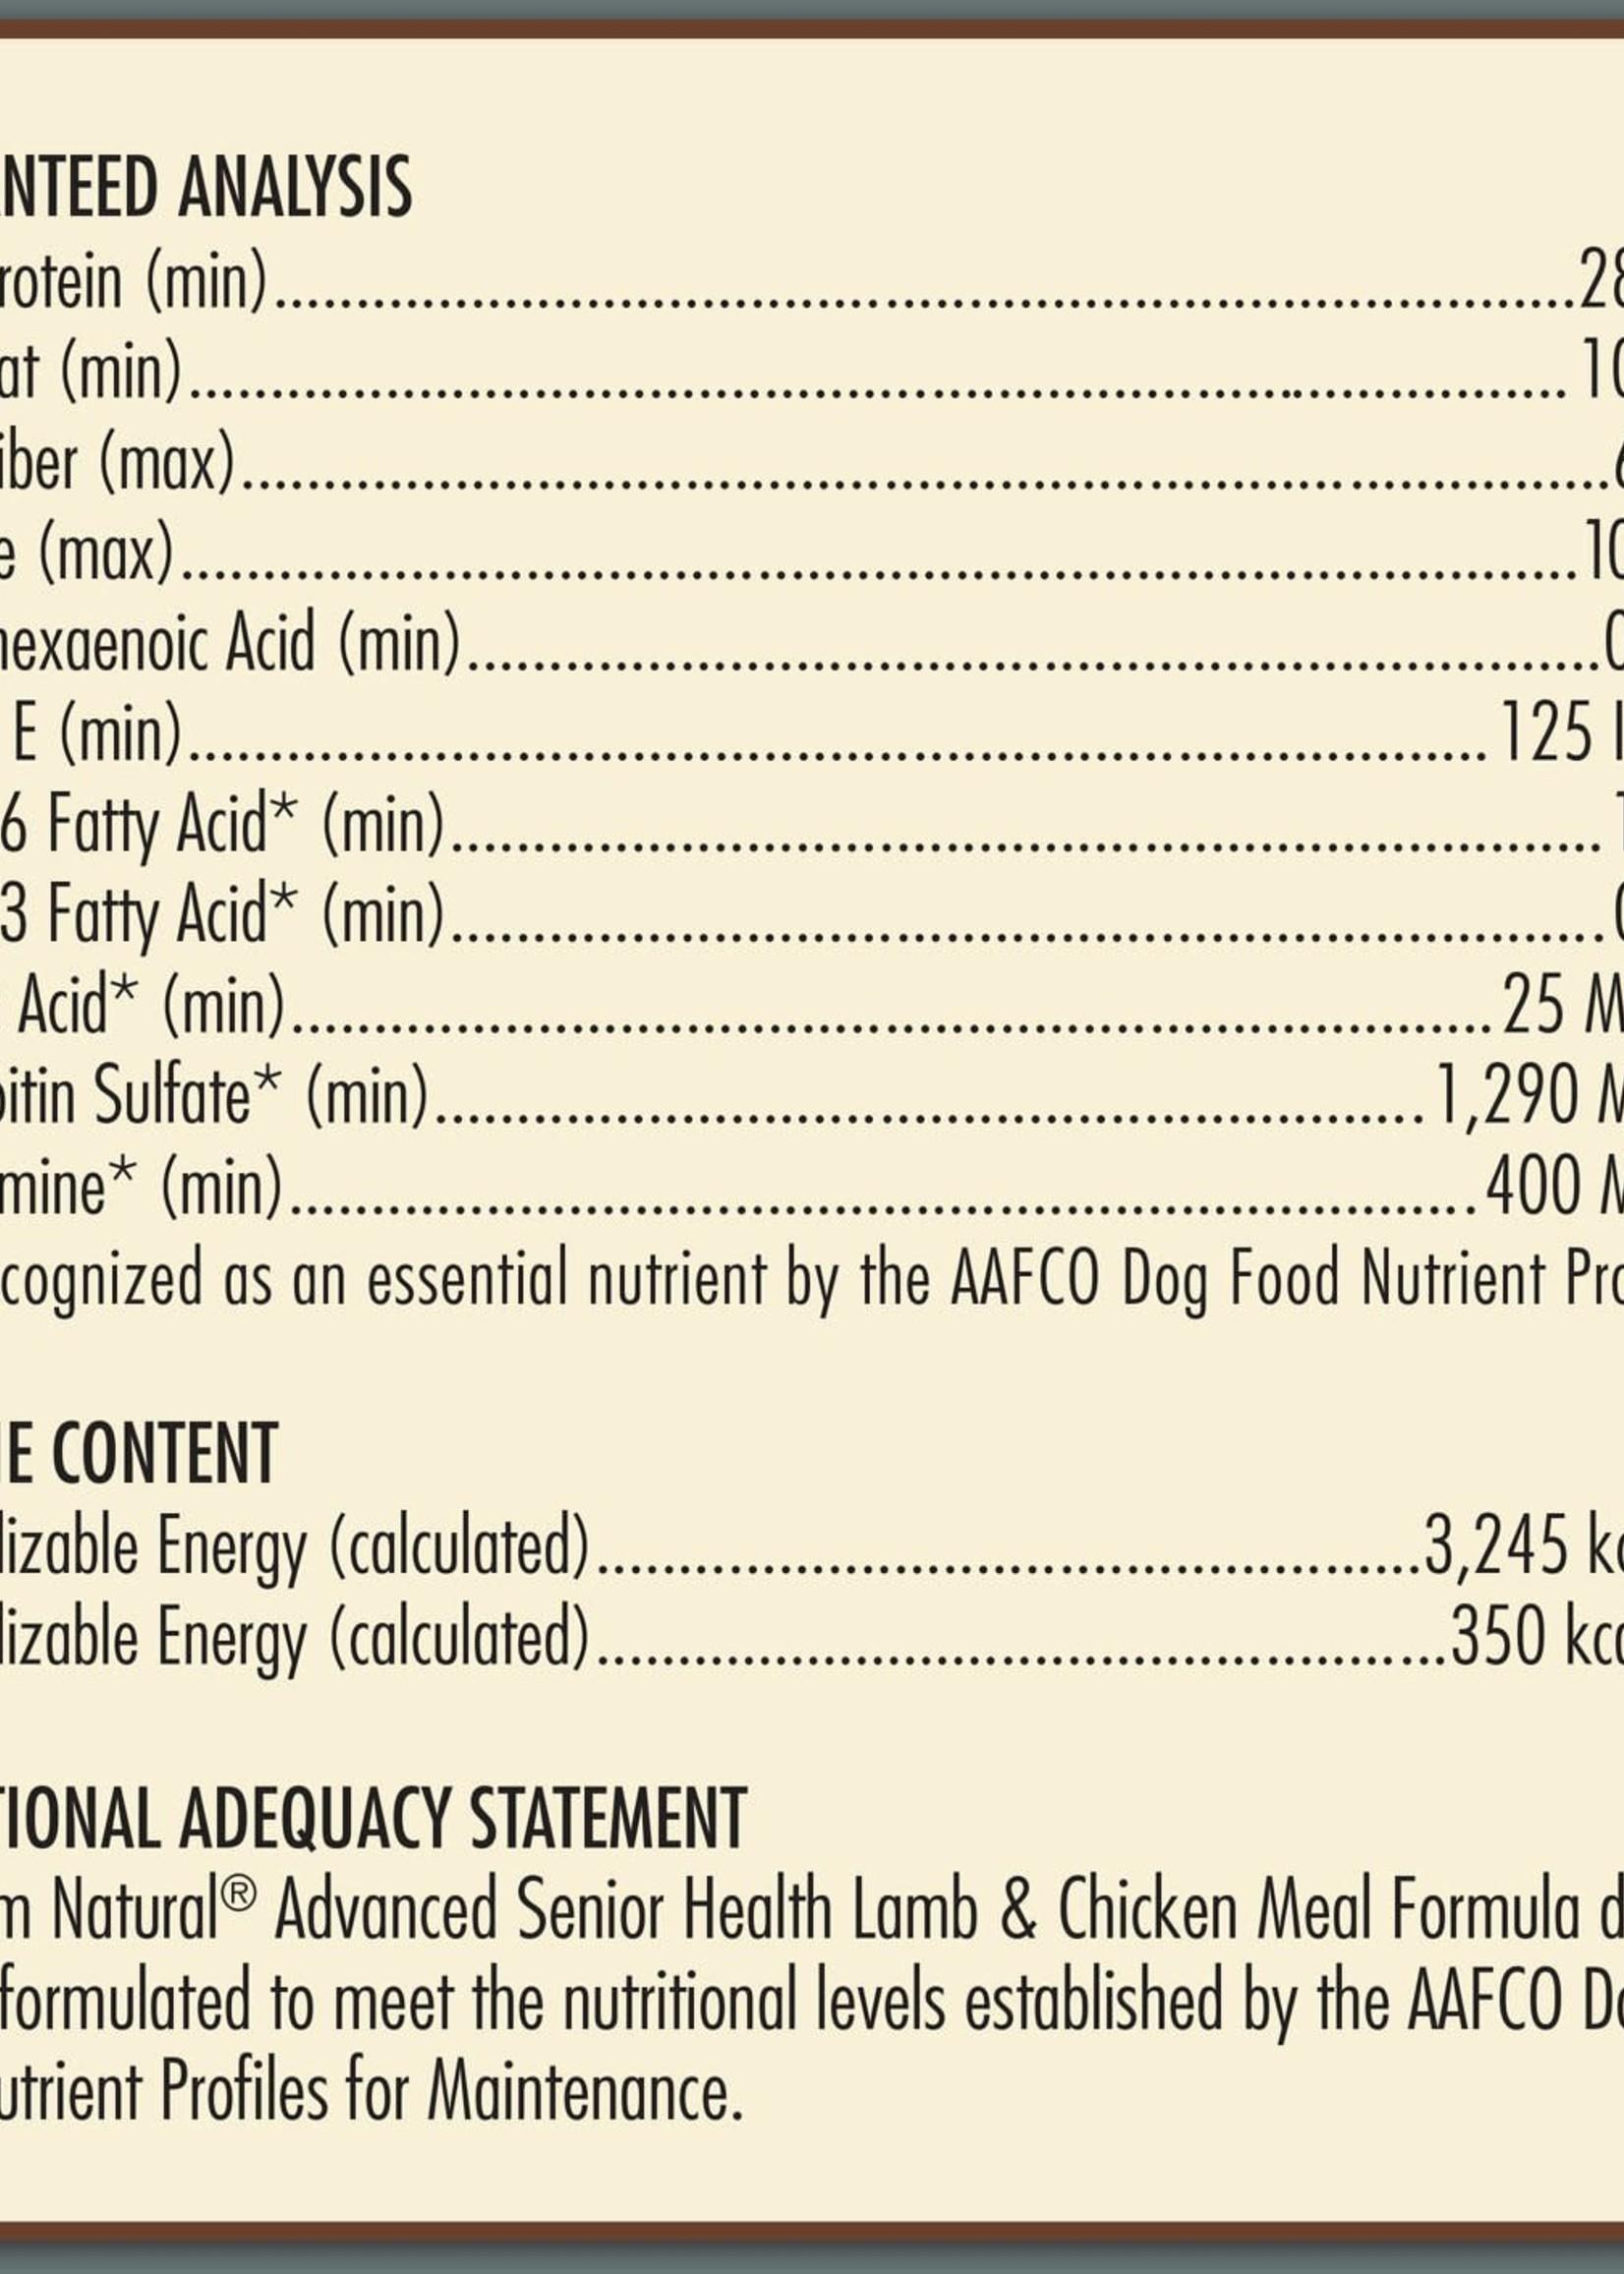 AvoDerm by Breeder's Choice AvoDerm Dog Dry Lamb and Chicken Senior Health